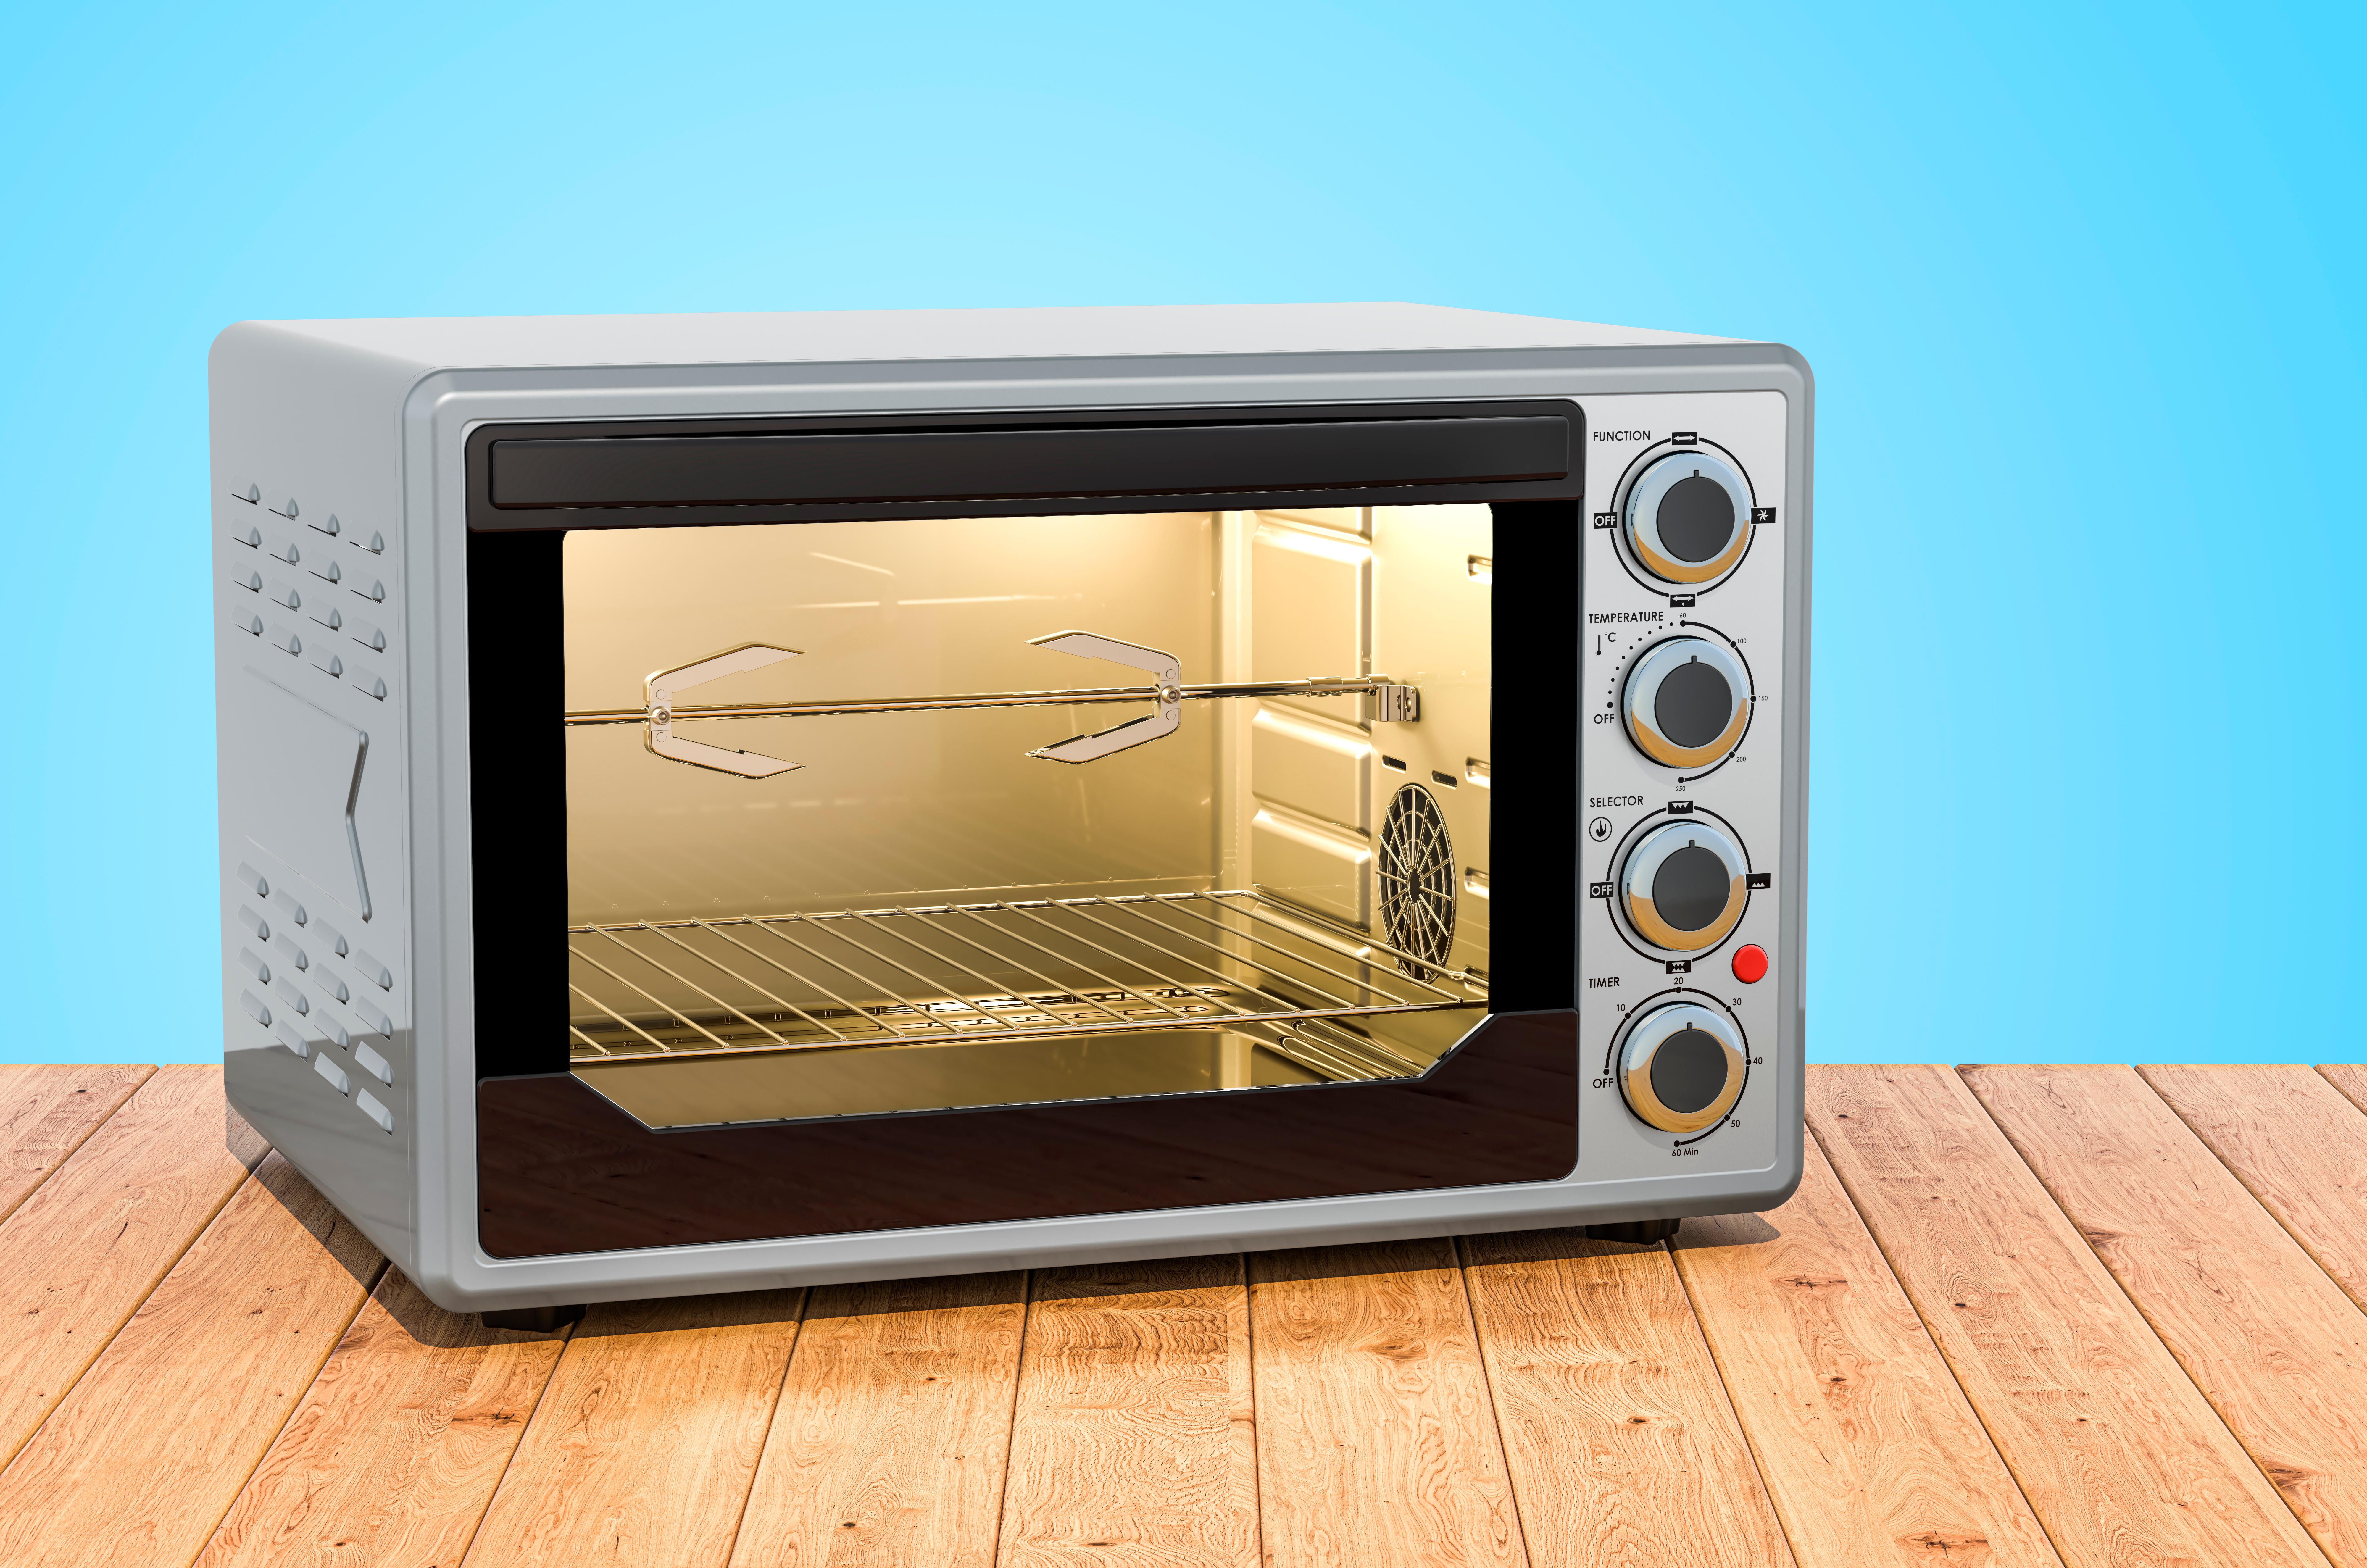 Top 15 Best Rotisserie Ovens in 2020